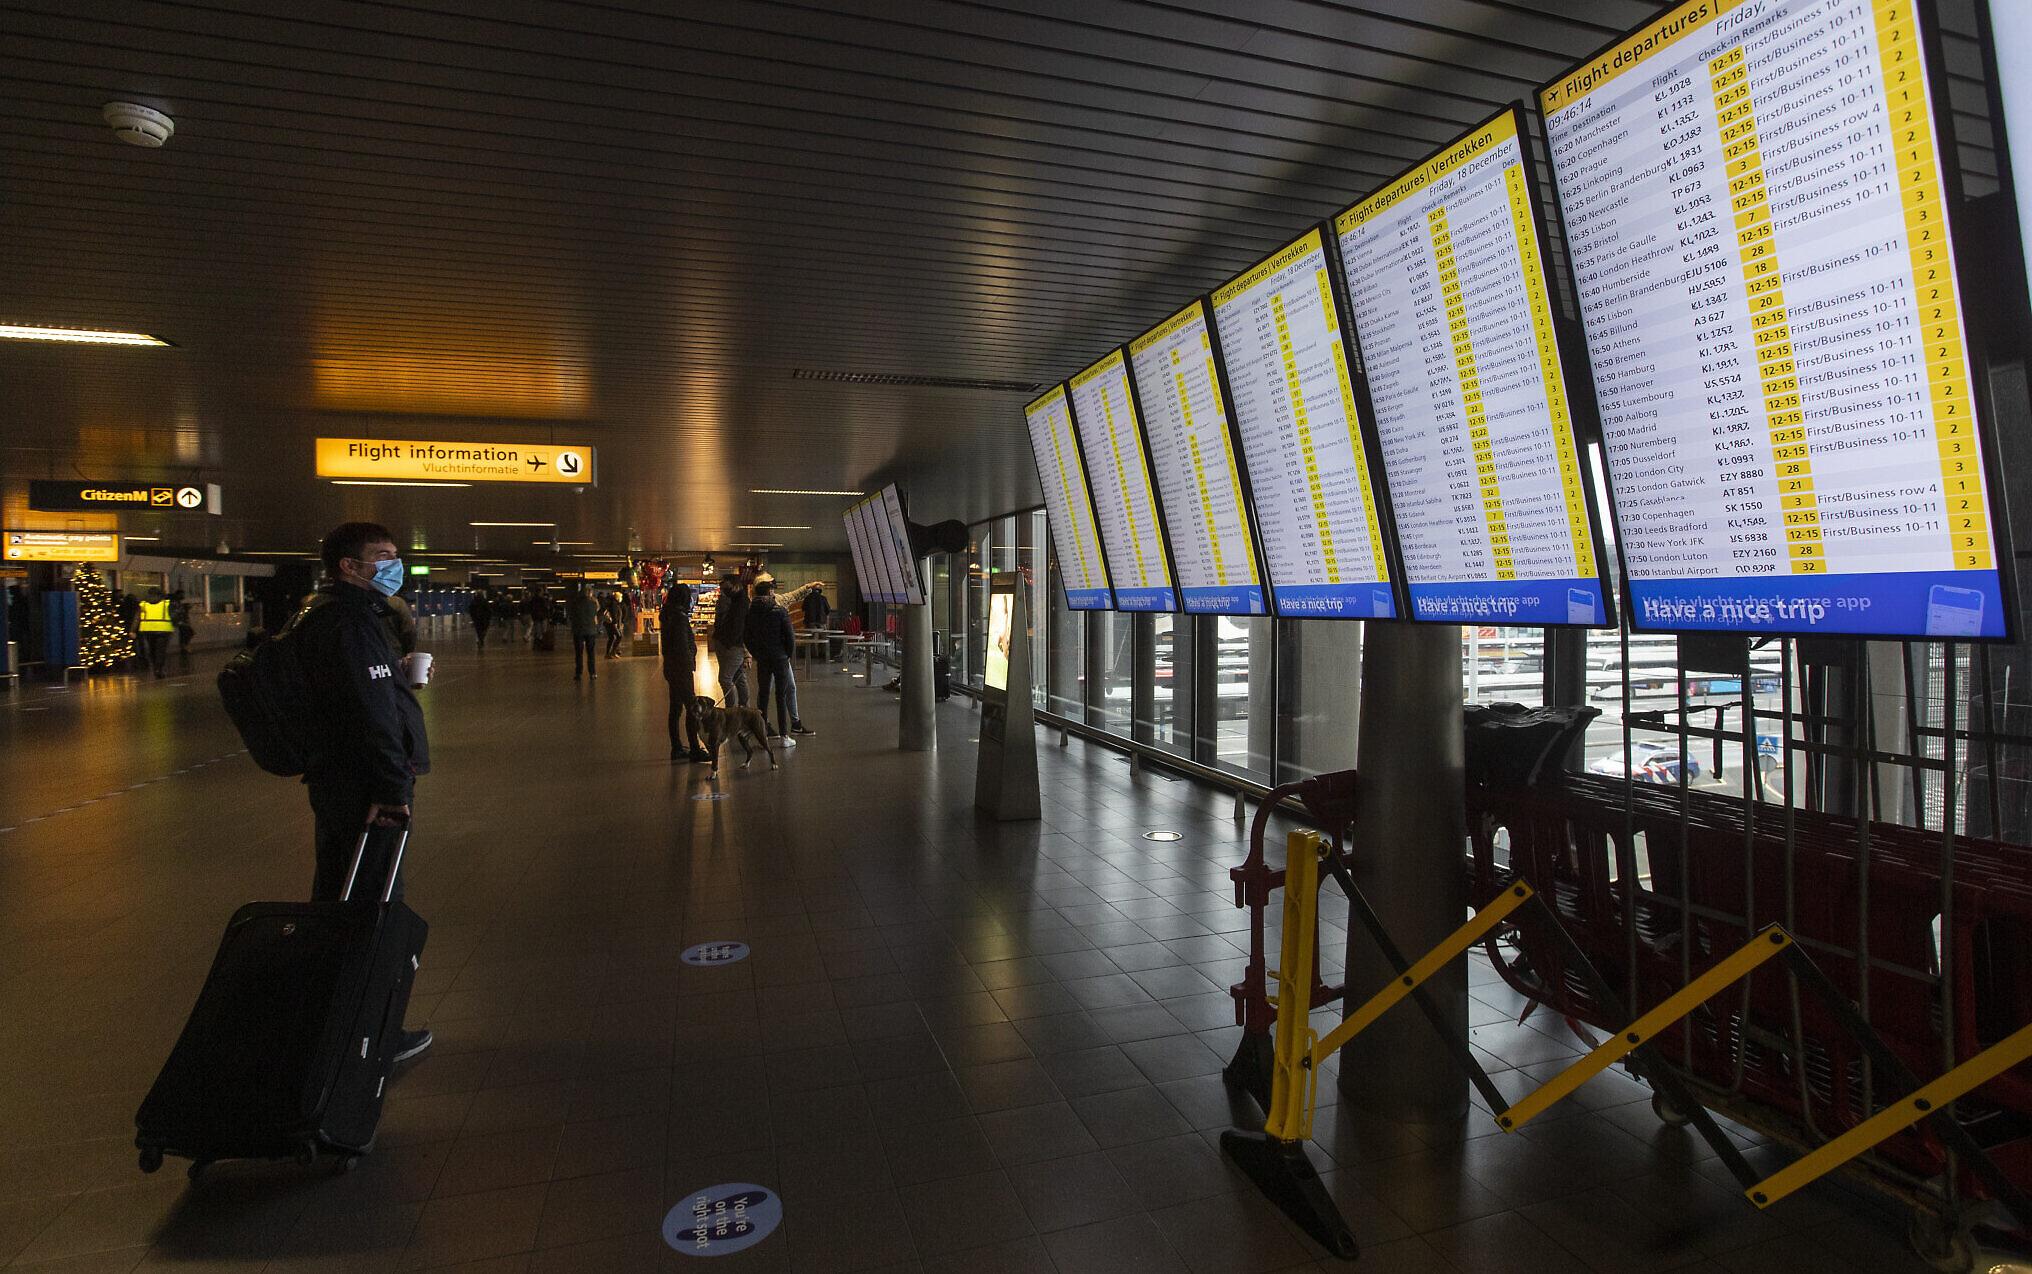 48-hour travel suspension from United Kingdom to Ireland over coronavirus strain